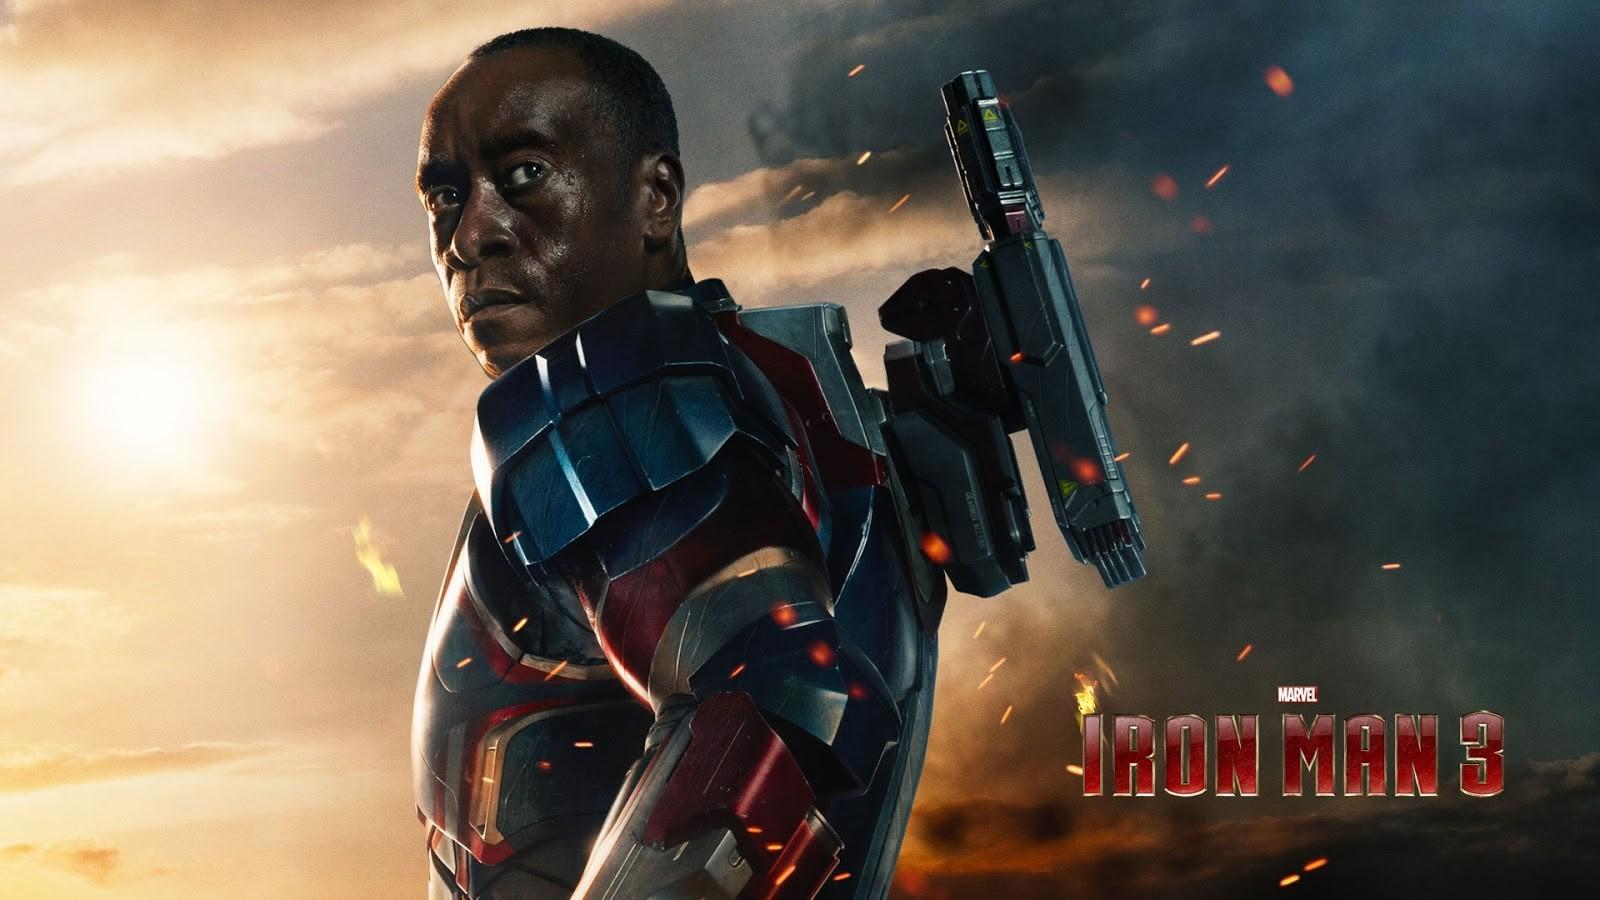 Don Cheadle Avengers